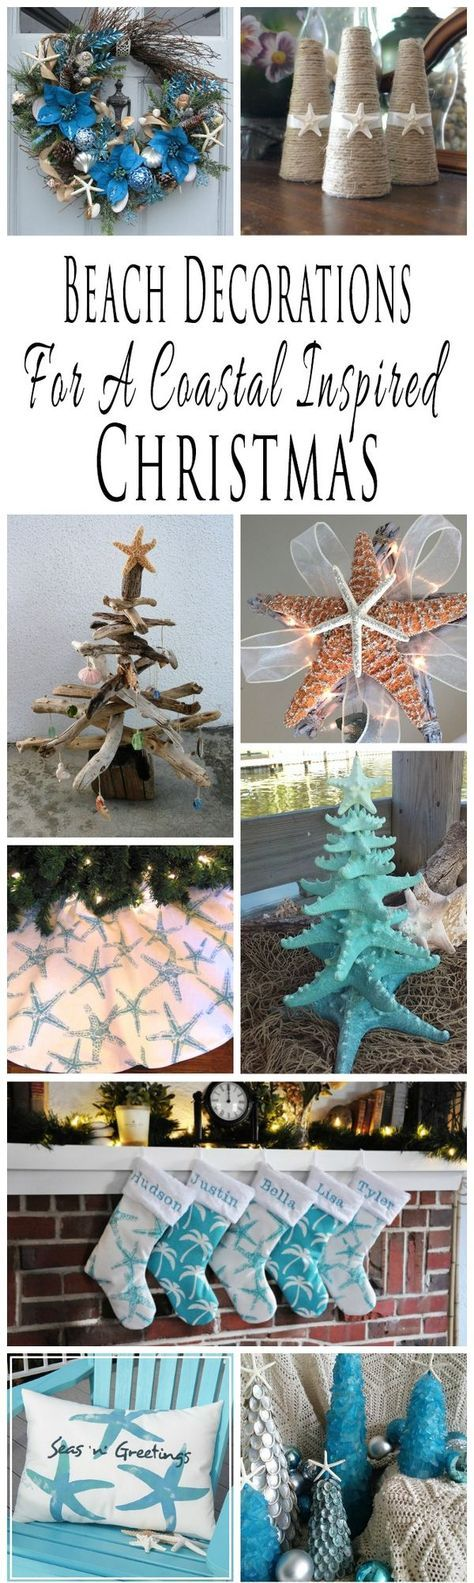 Handmade beach themed decorations and decor for a coastal inspired Christmas.